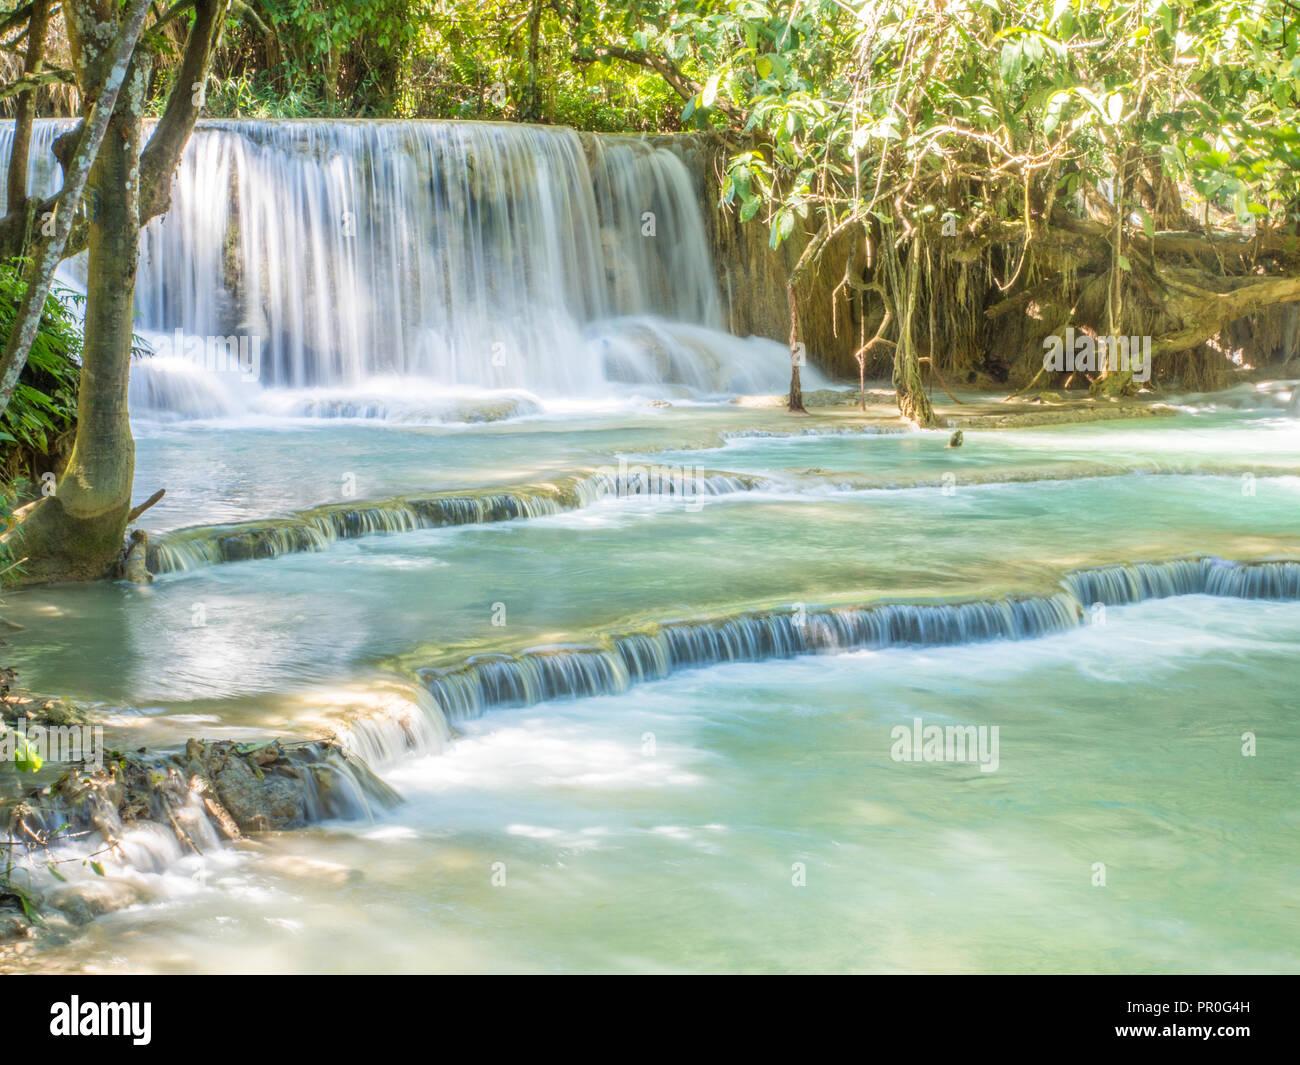 Keang Si cascata, Luang Prabang, Laos, Indocina, Asia sud-orientale, Asia Immagini Stock